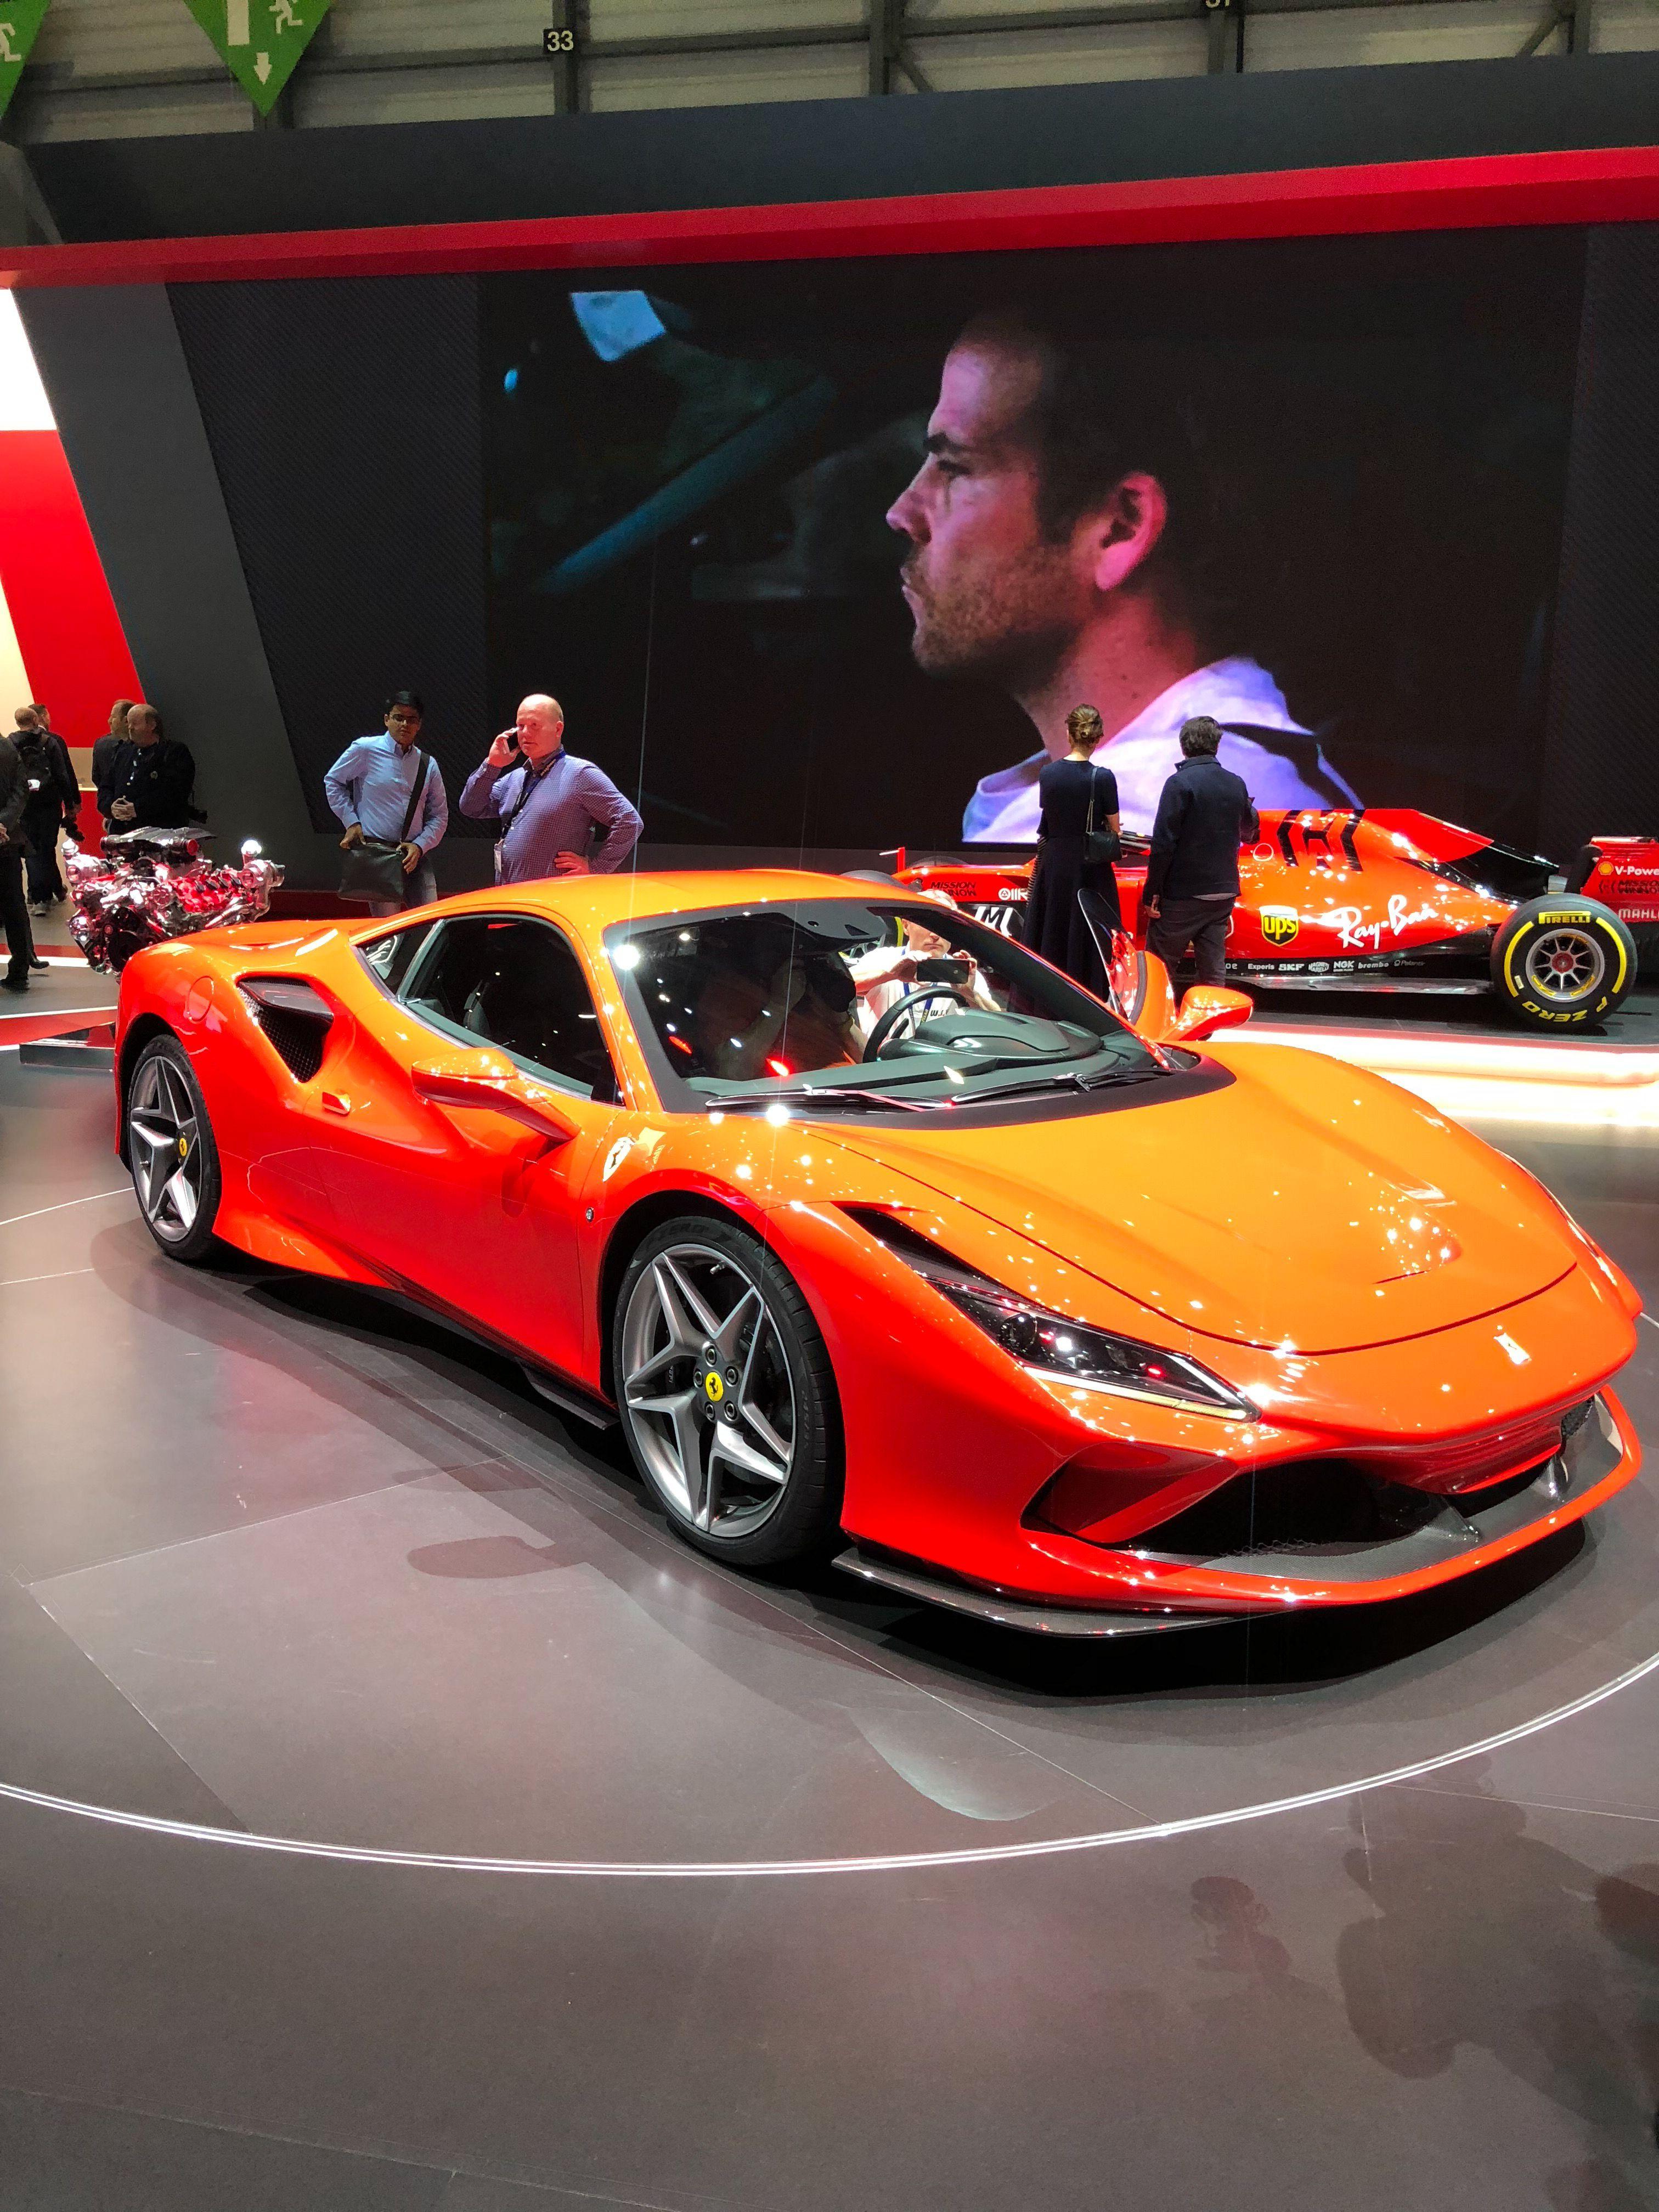 Ferrari F8 Tributo \u2013 Returns the Mid,Engined Sports Car to